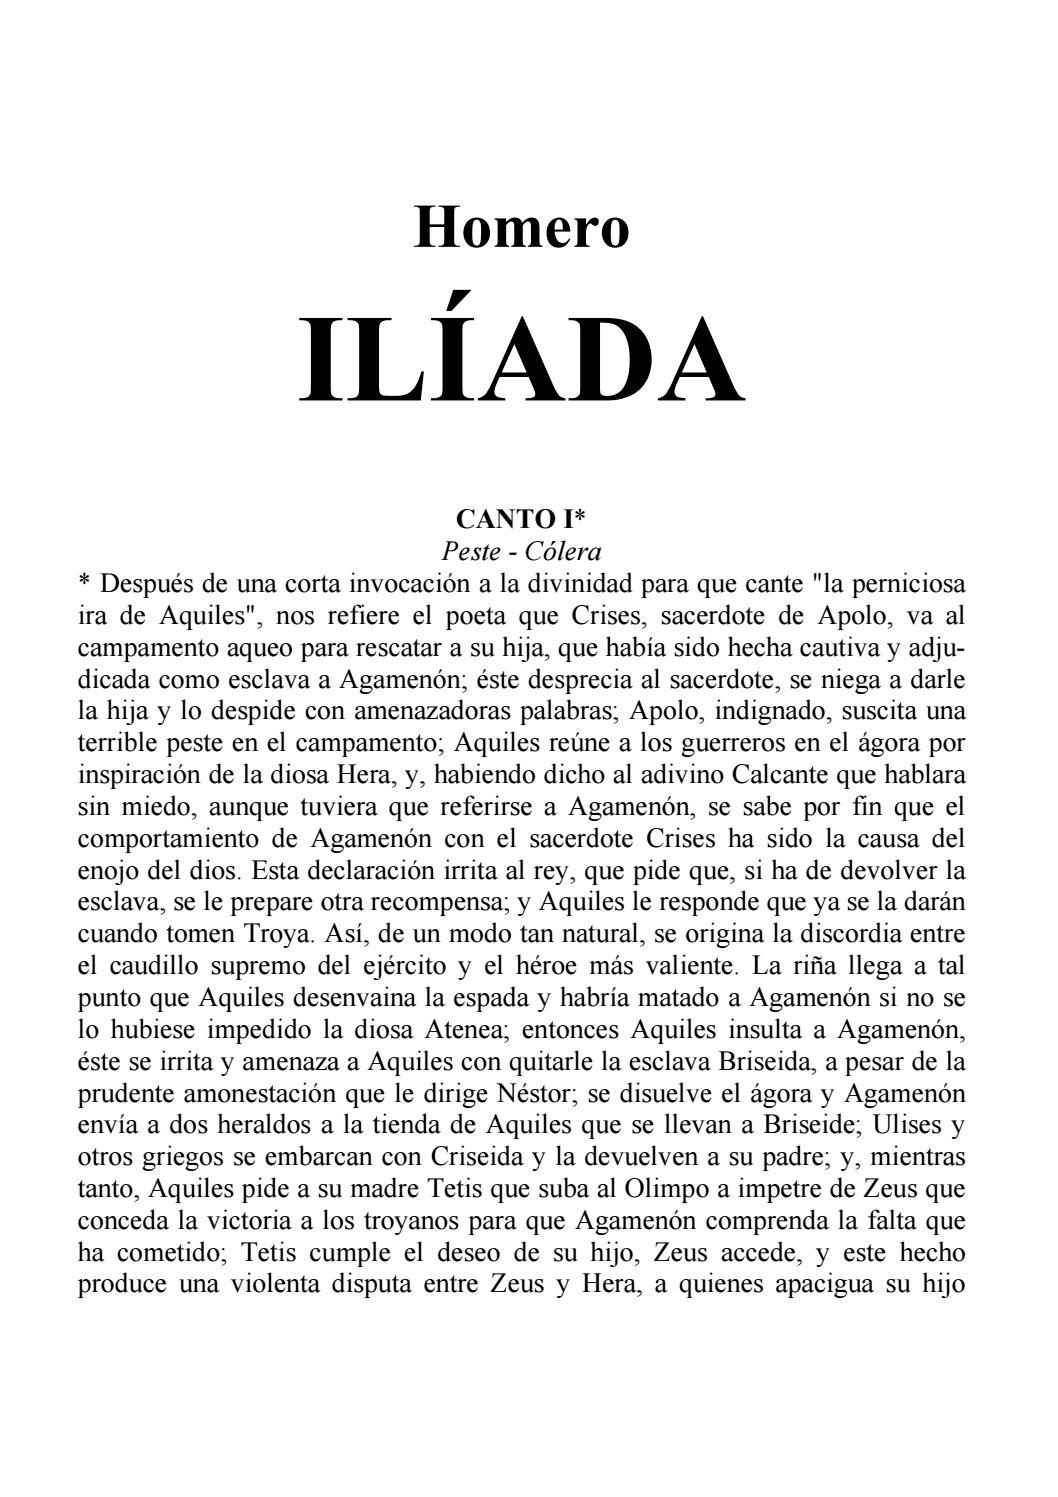 La ilíada by munditeca2018 - issuu